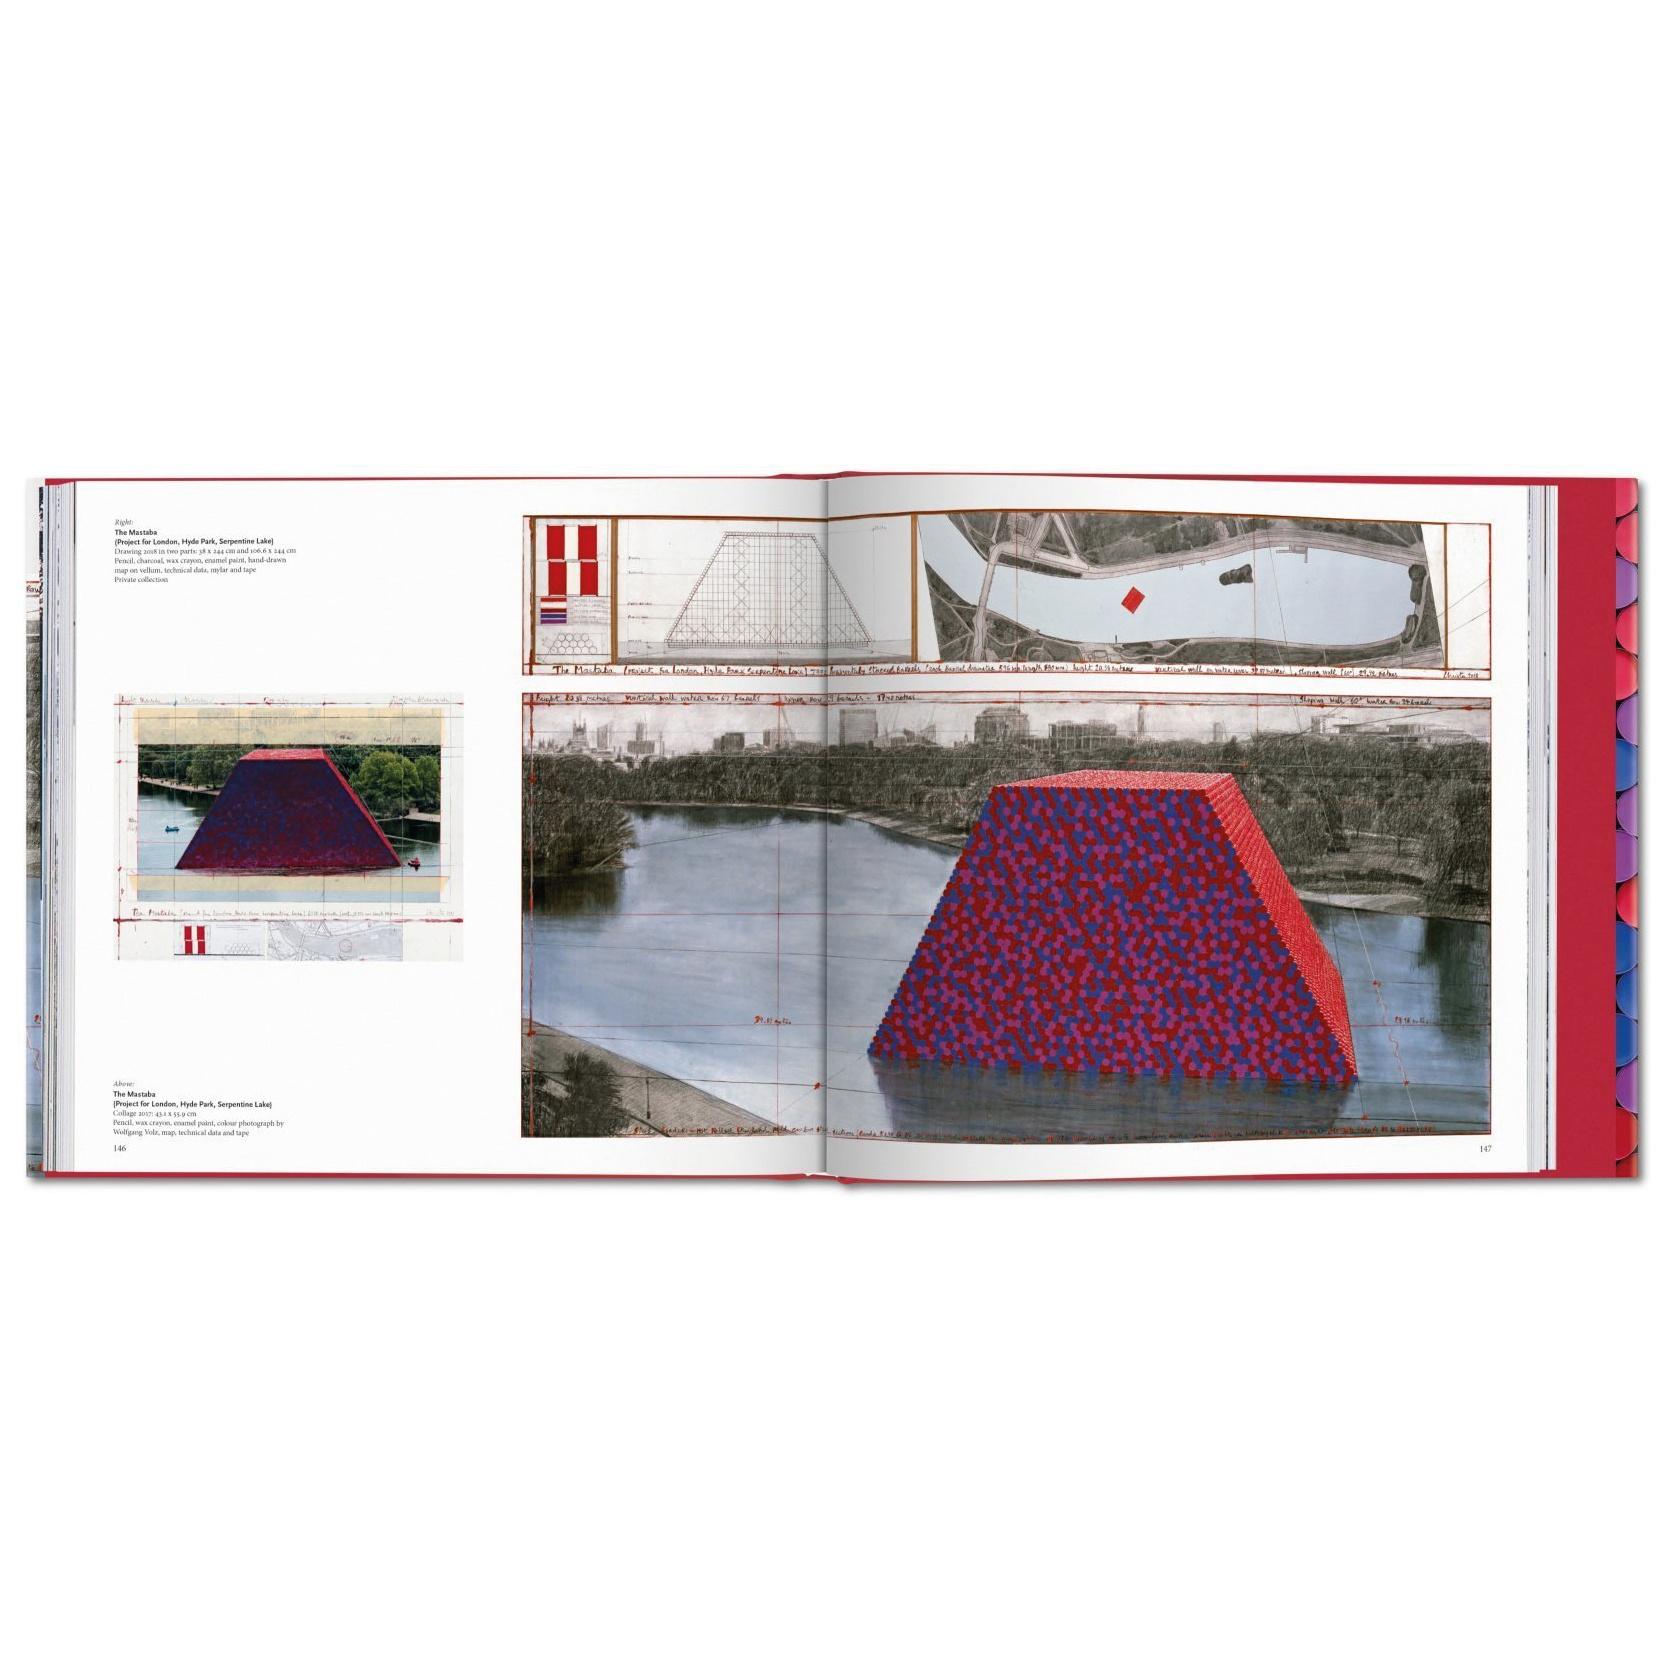 Christo & Jeanne-Claude